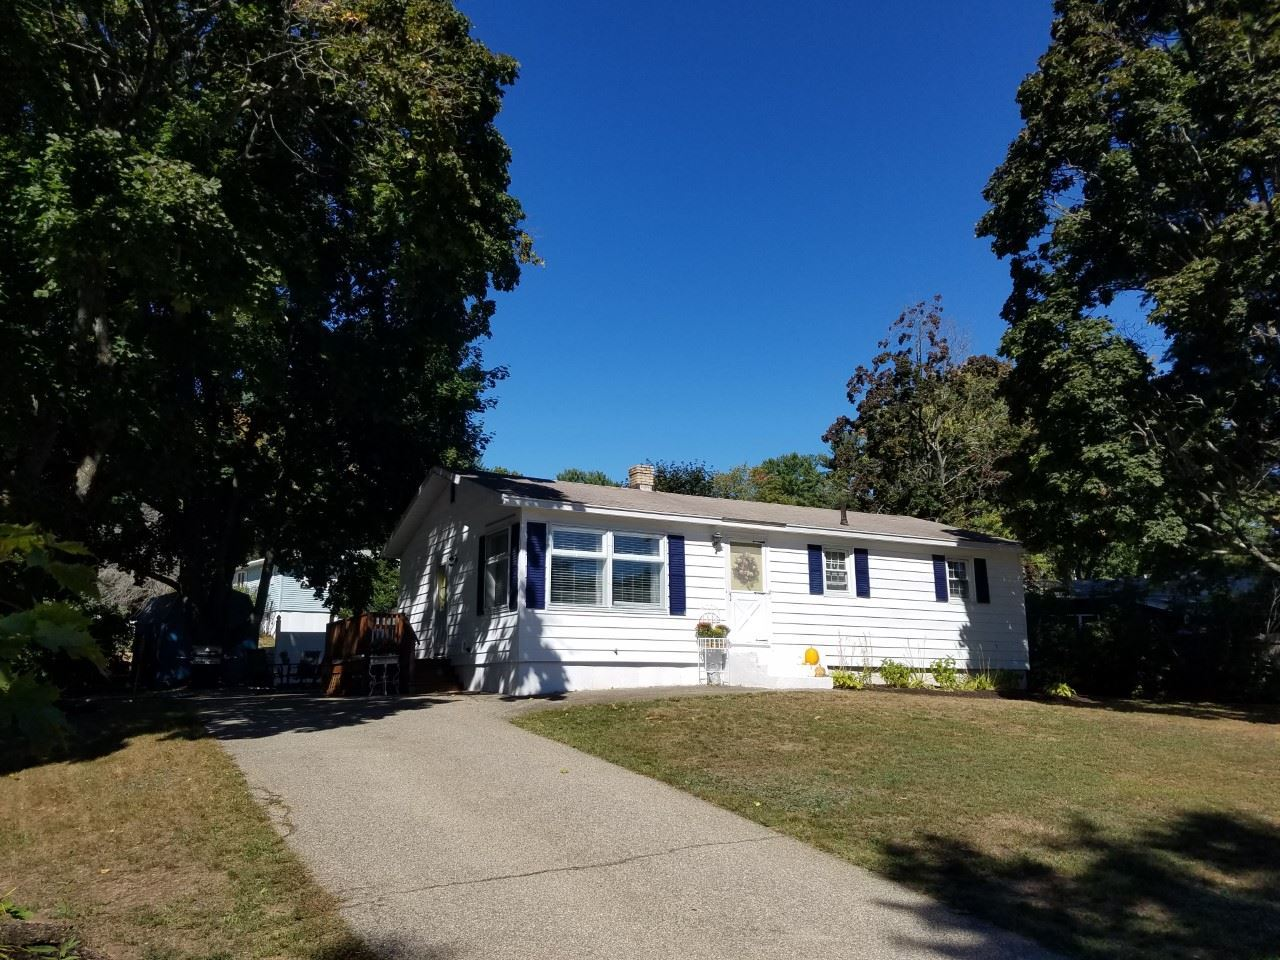 30 Morningside Drive, Dover, NH 03820 - MLS#: 4830509